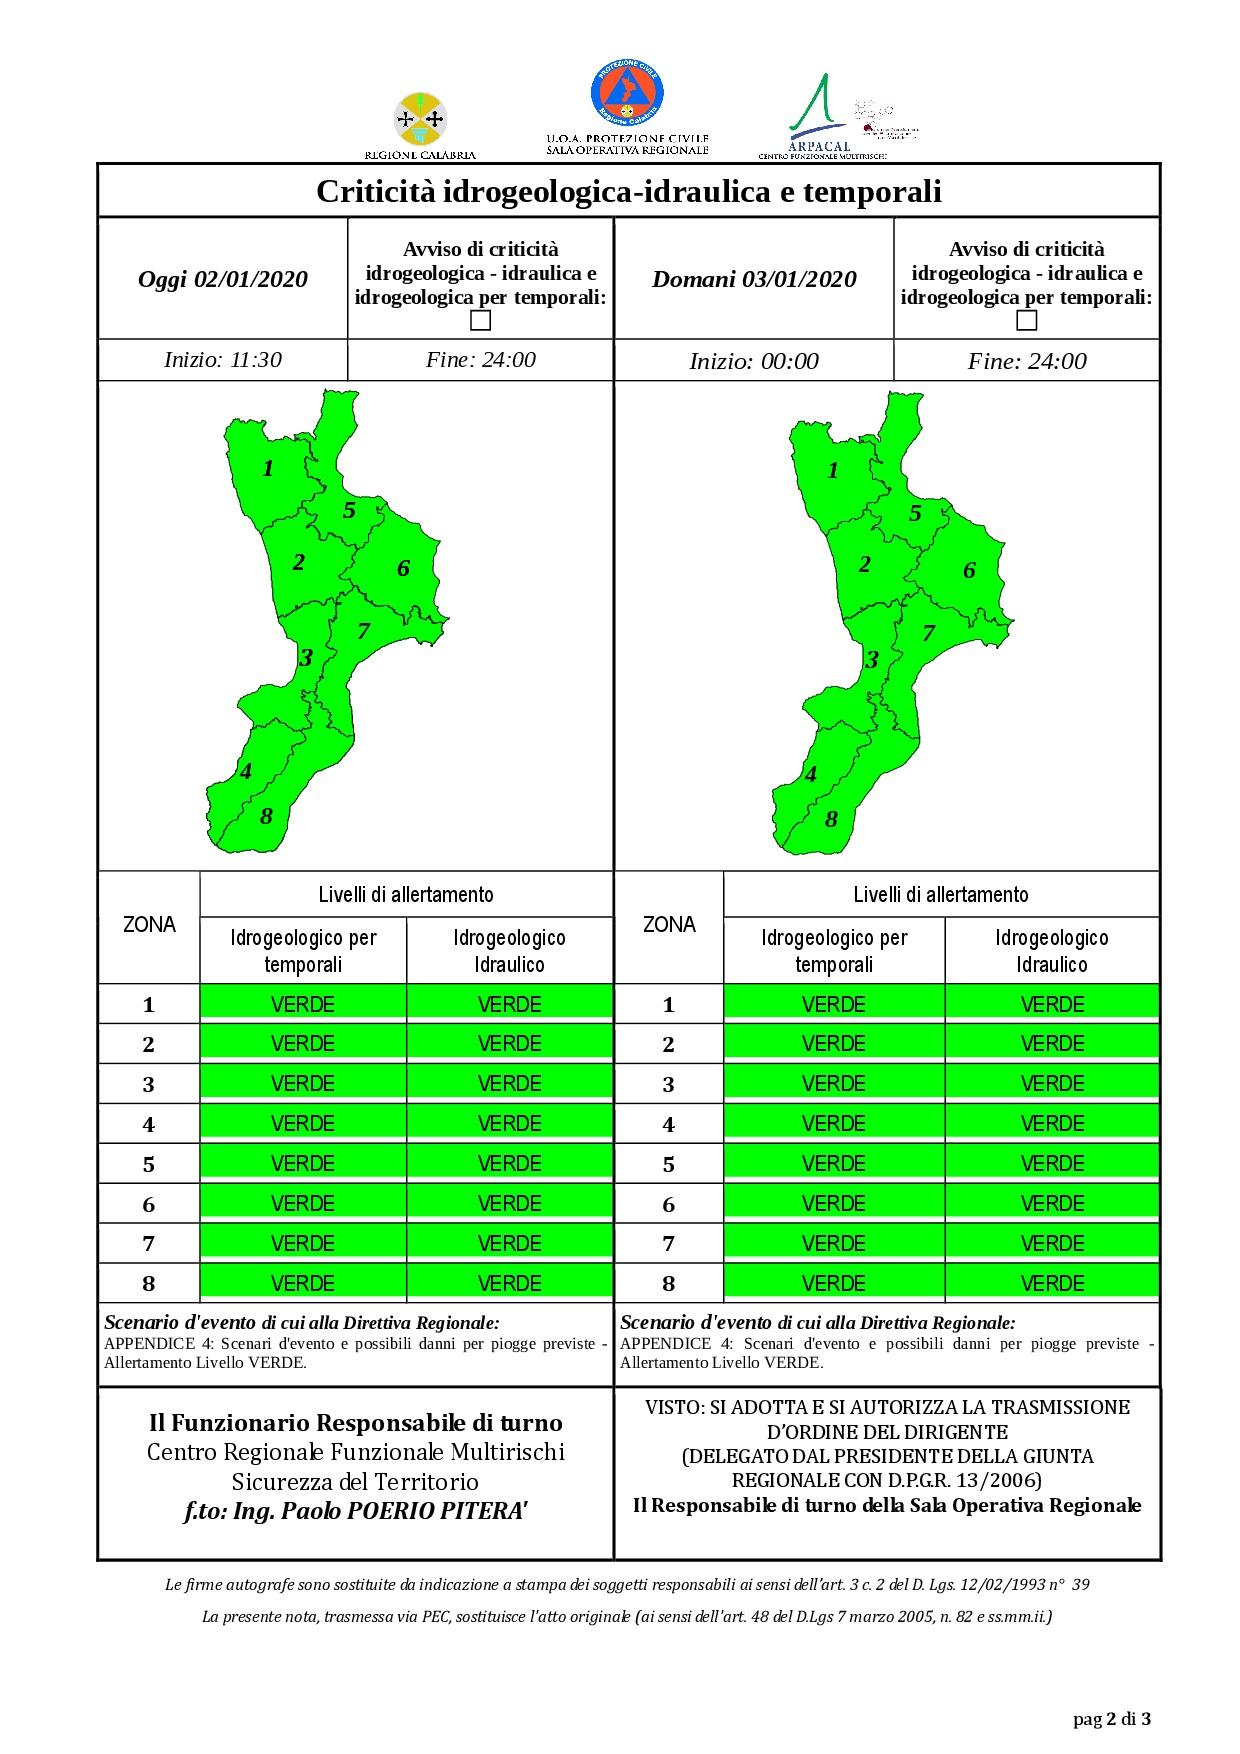 Criticità idrogeologica-idraulica e temporali in Calabria 02-01-2020